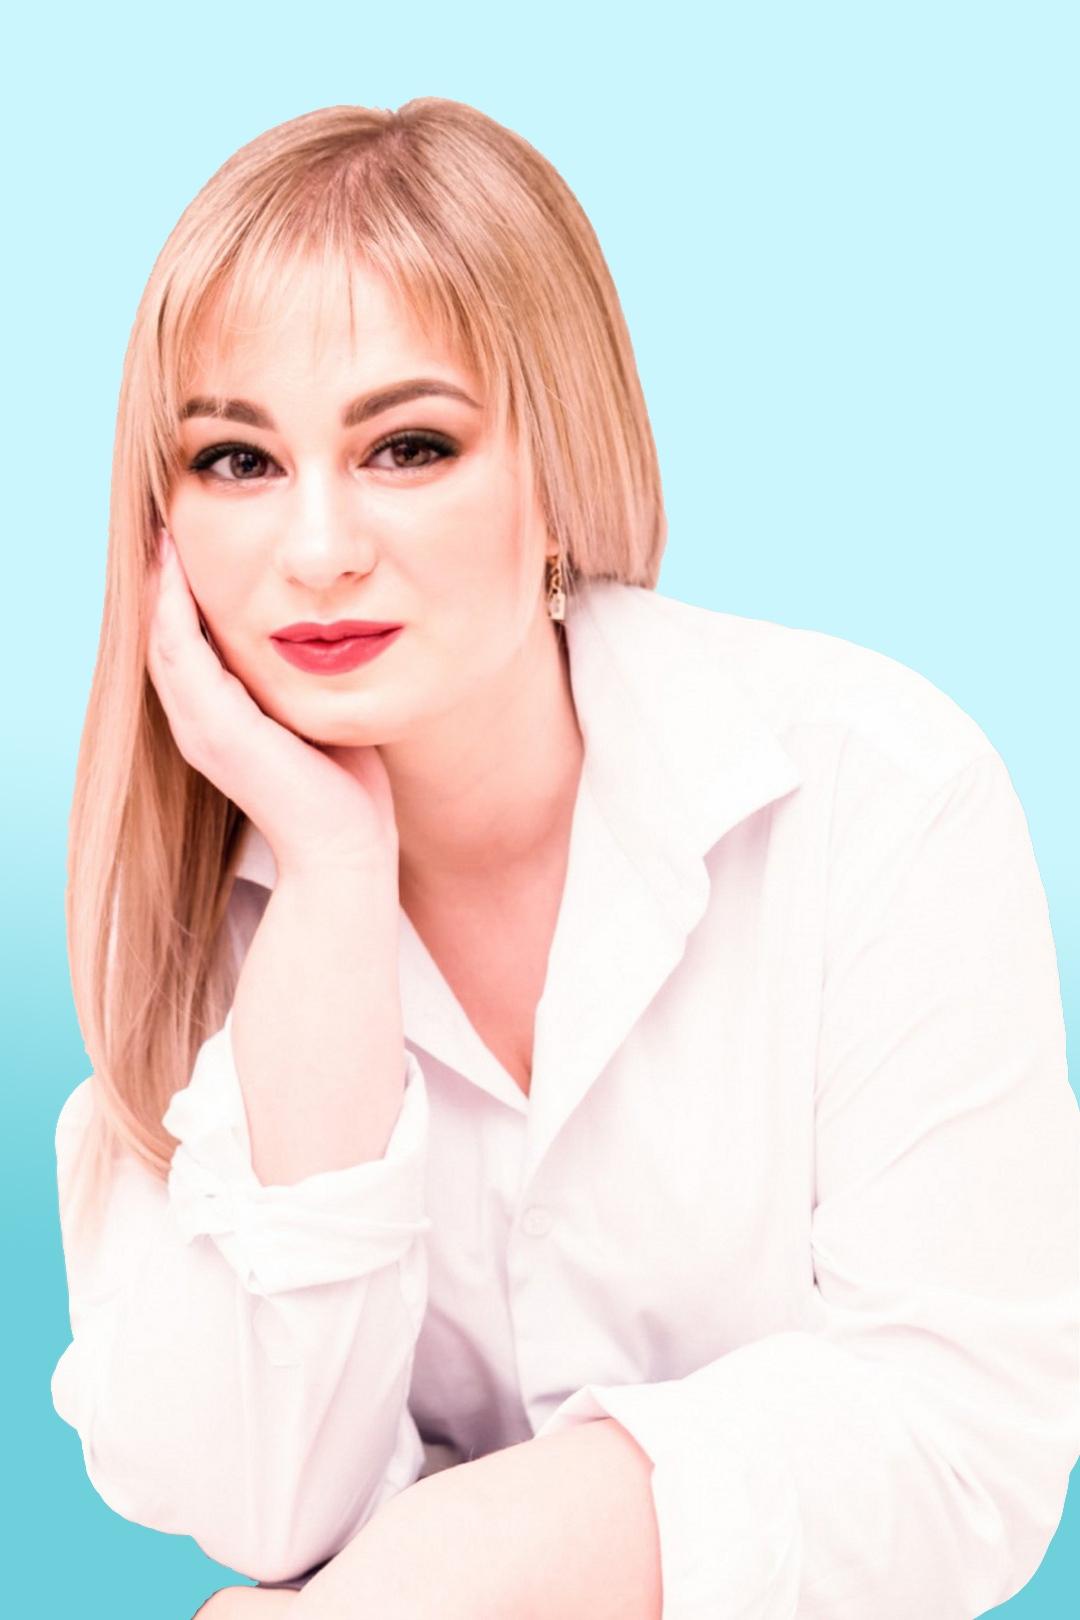 Врач-психиатр, нарколог, психотерапевт Сысоева Вероника Петровна